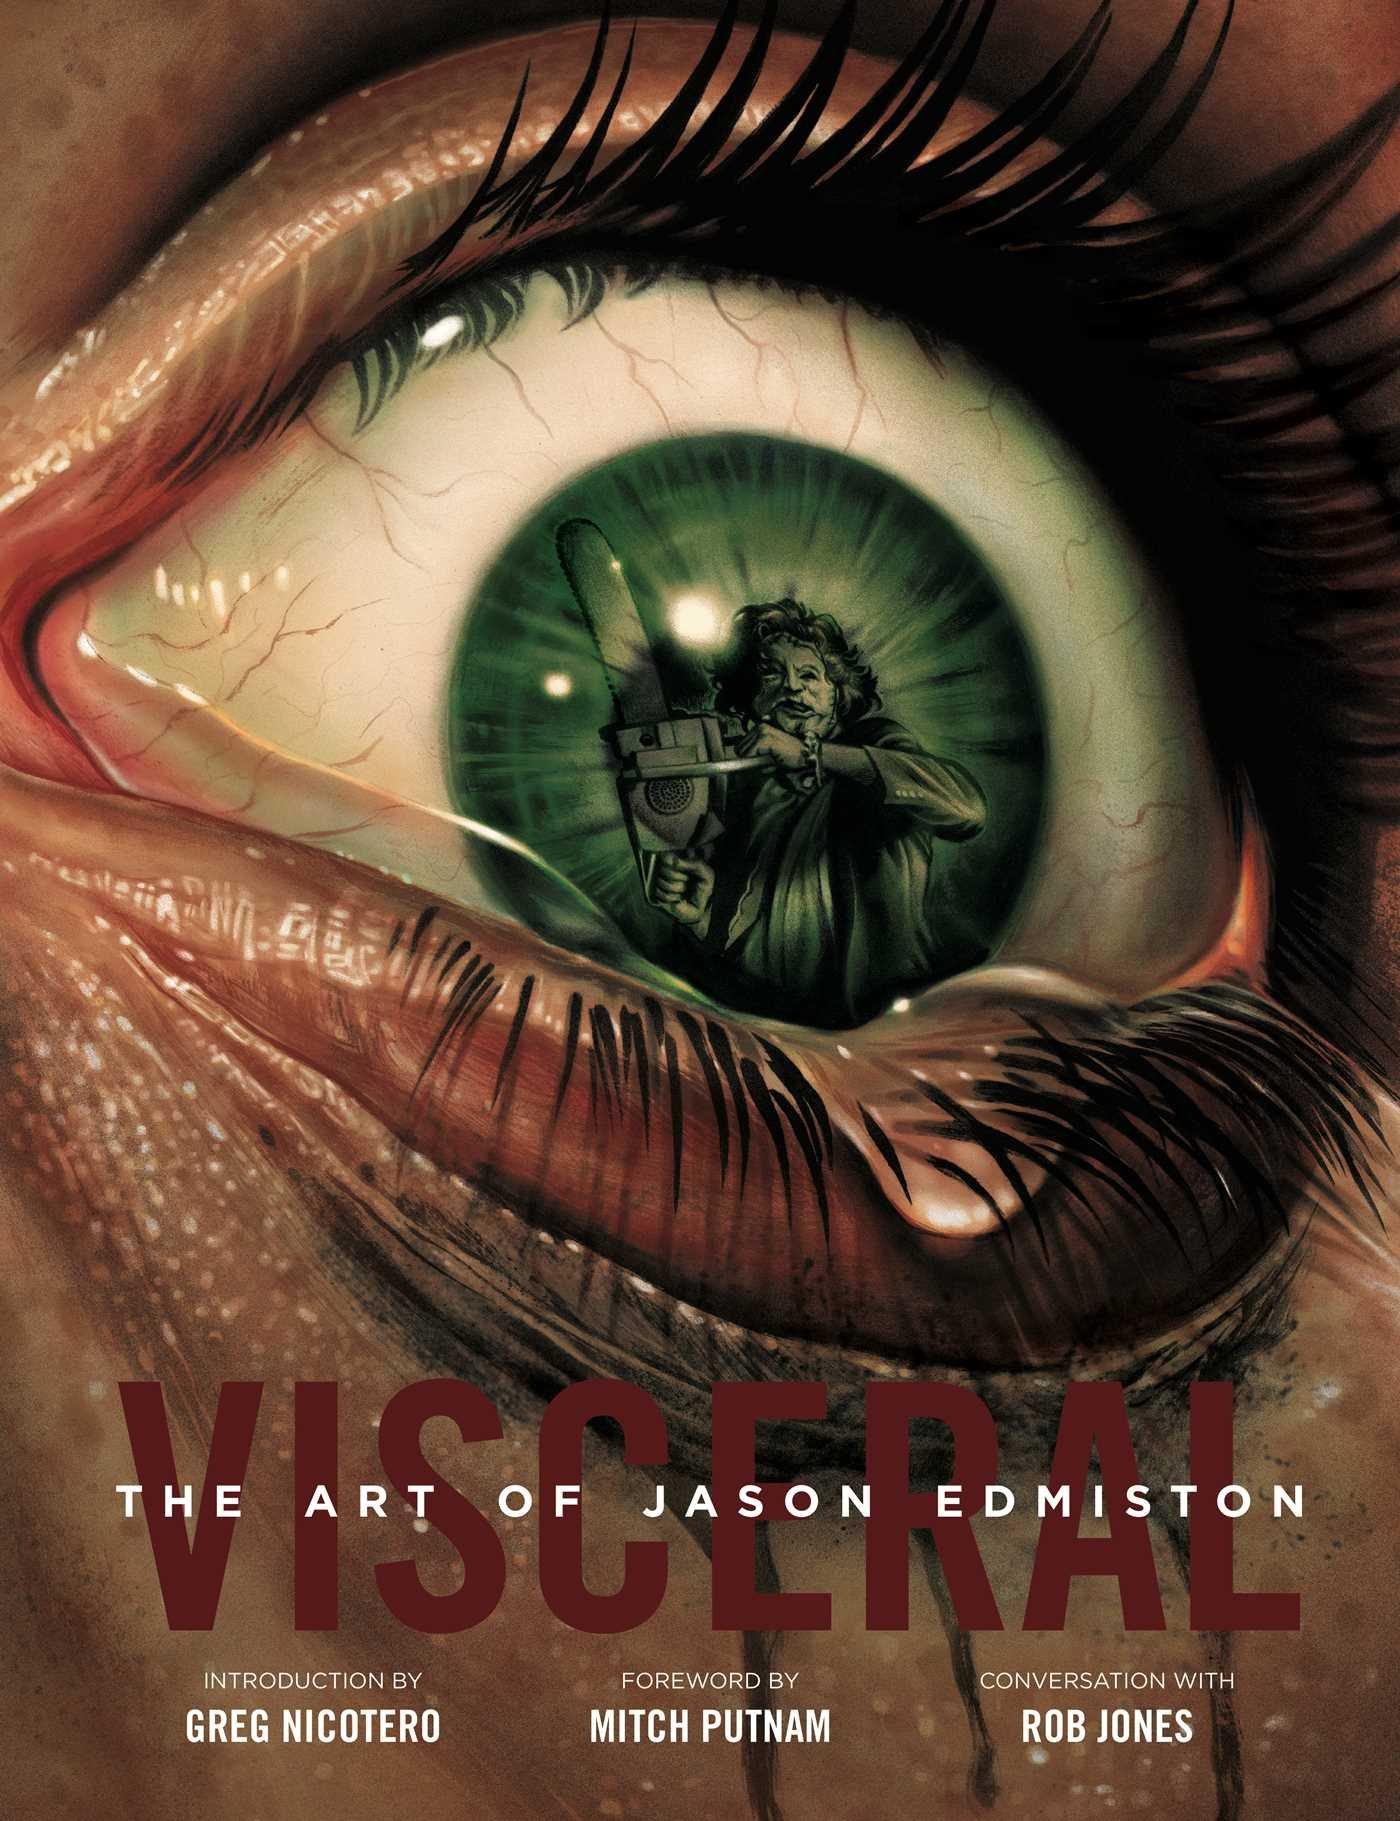 VISCERAL: The art of Jason Edmiston